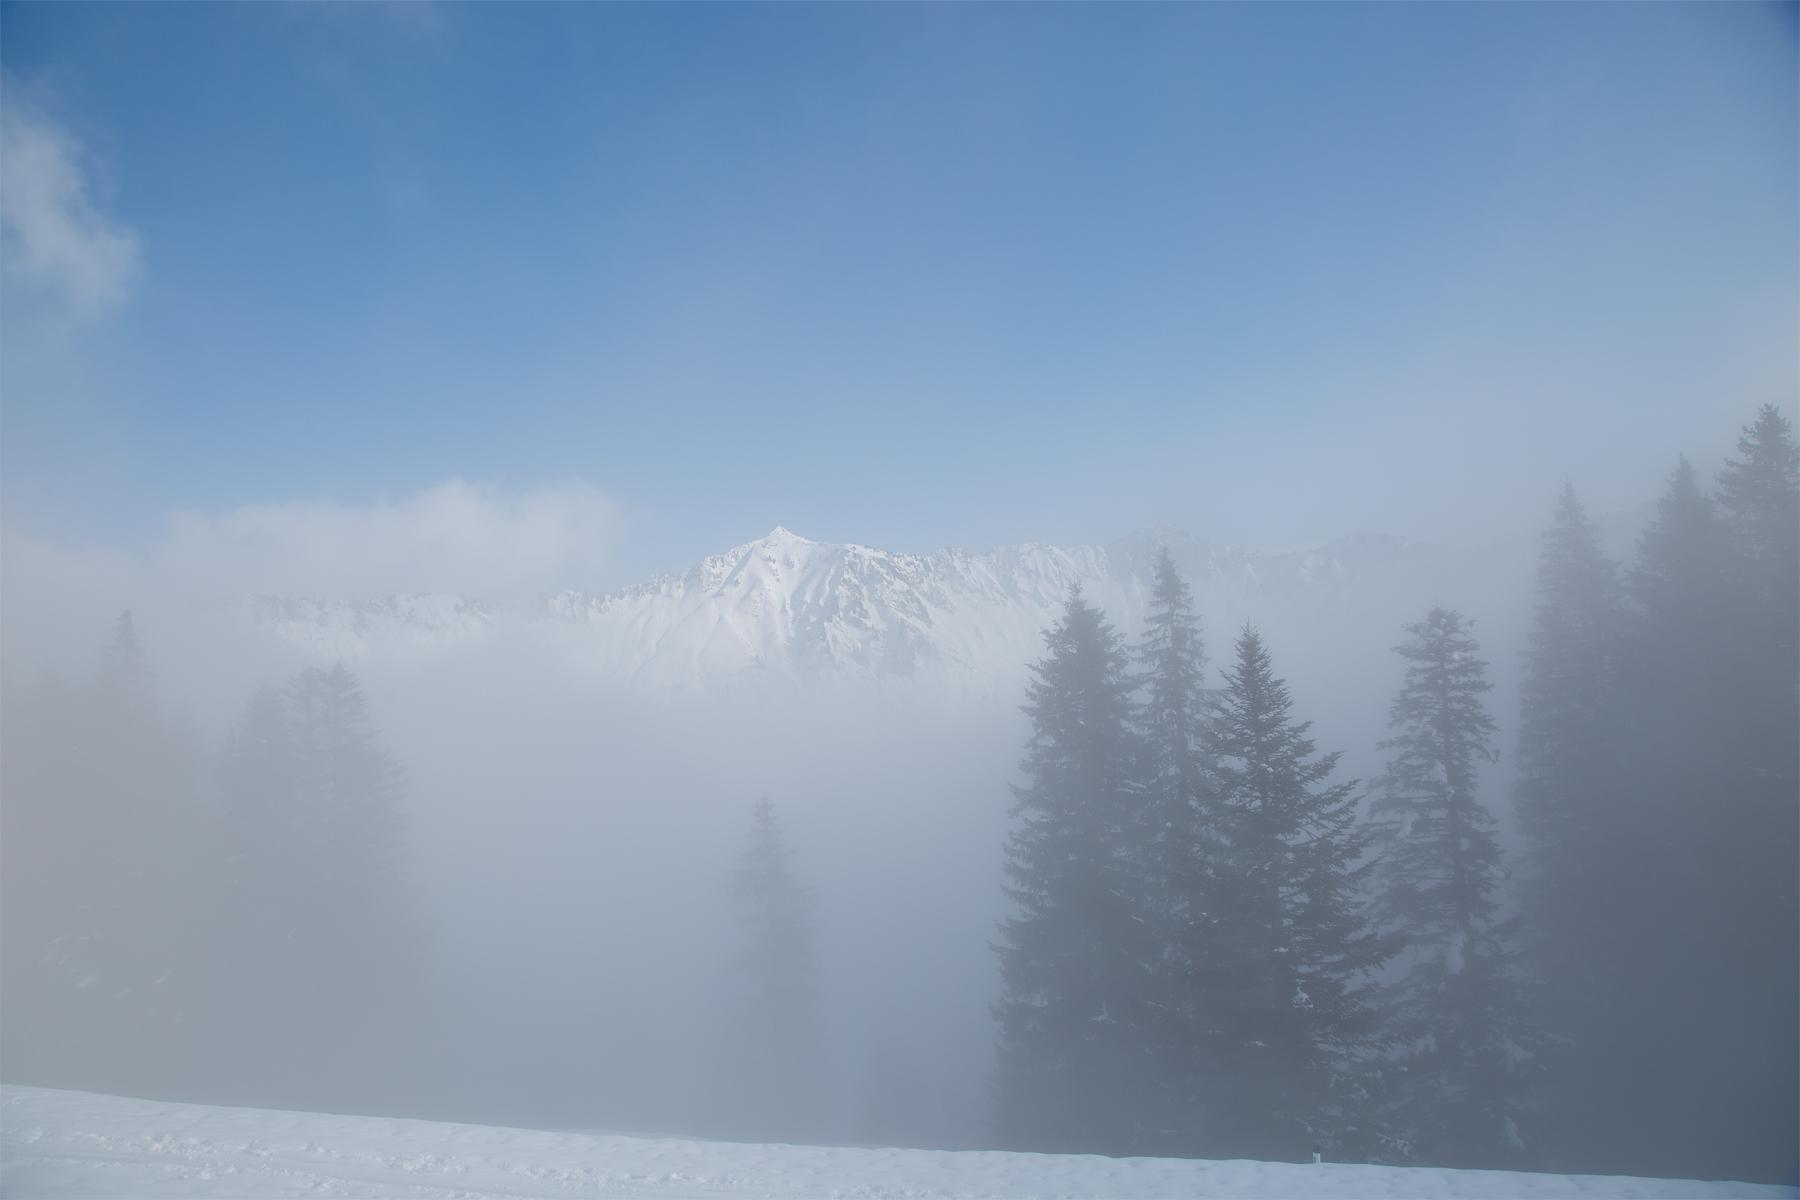 Löffelspitze durch Nebelschwaden